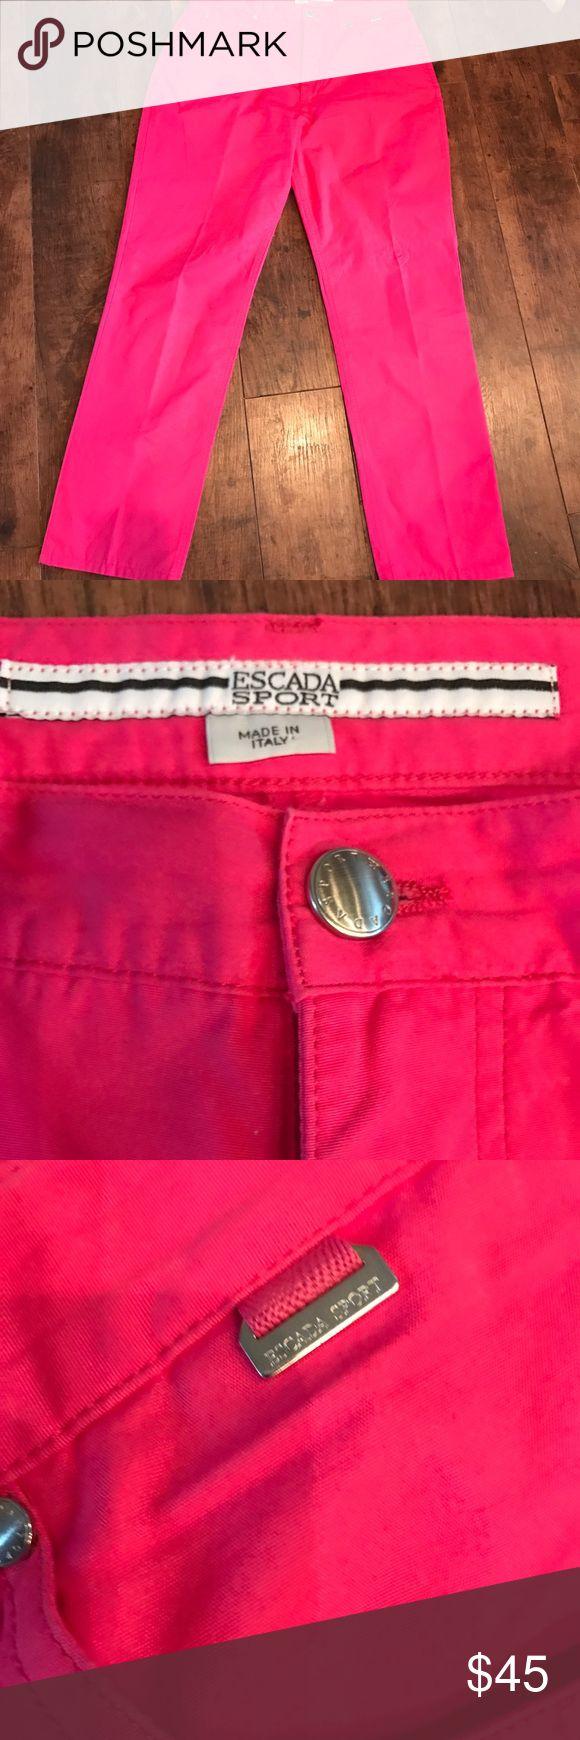 Escada Sport hot pink pants - like New Like new, never written! Escada Sport zipper and button closure, size 40, 29 1/2 inch inseam, non smoking home Escada Sport  Pants